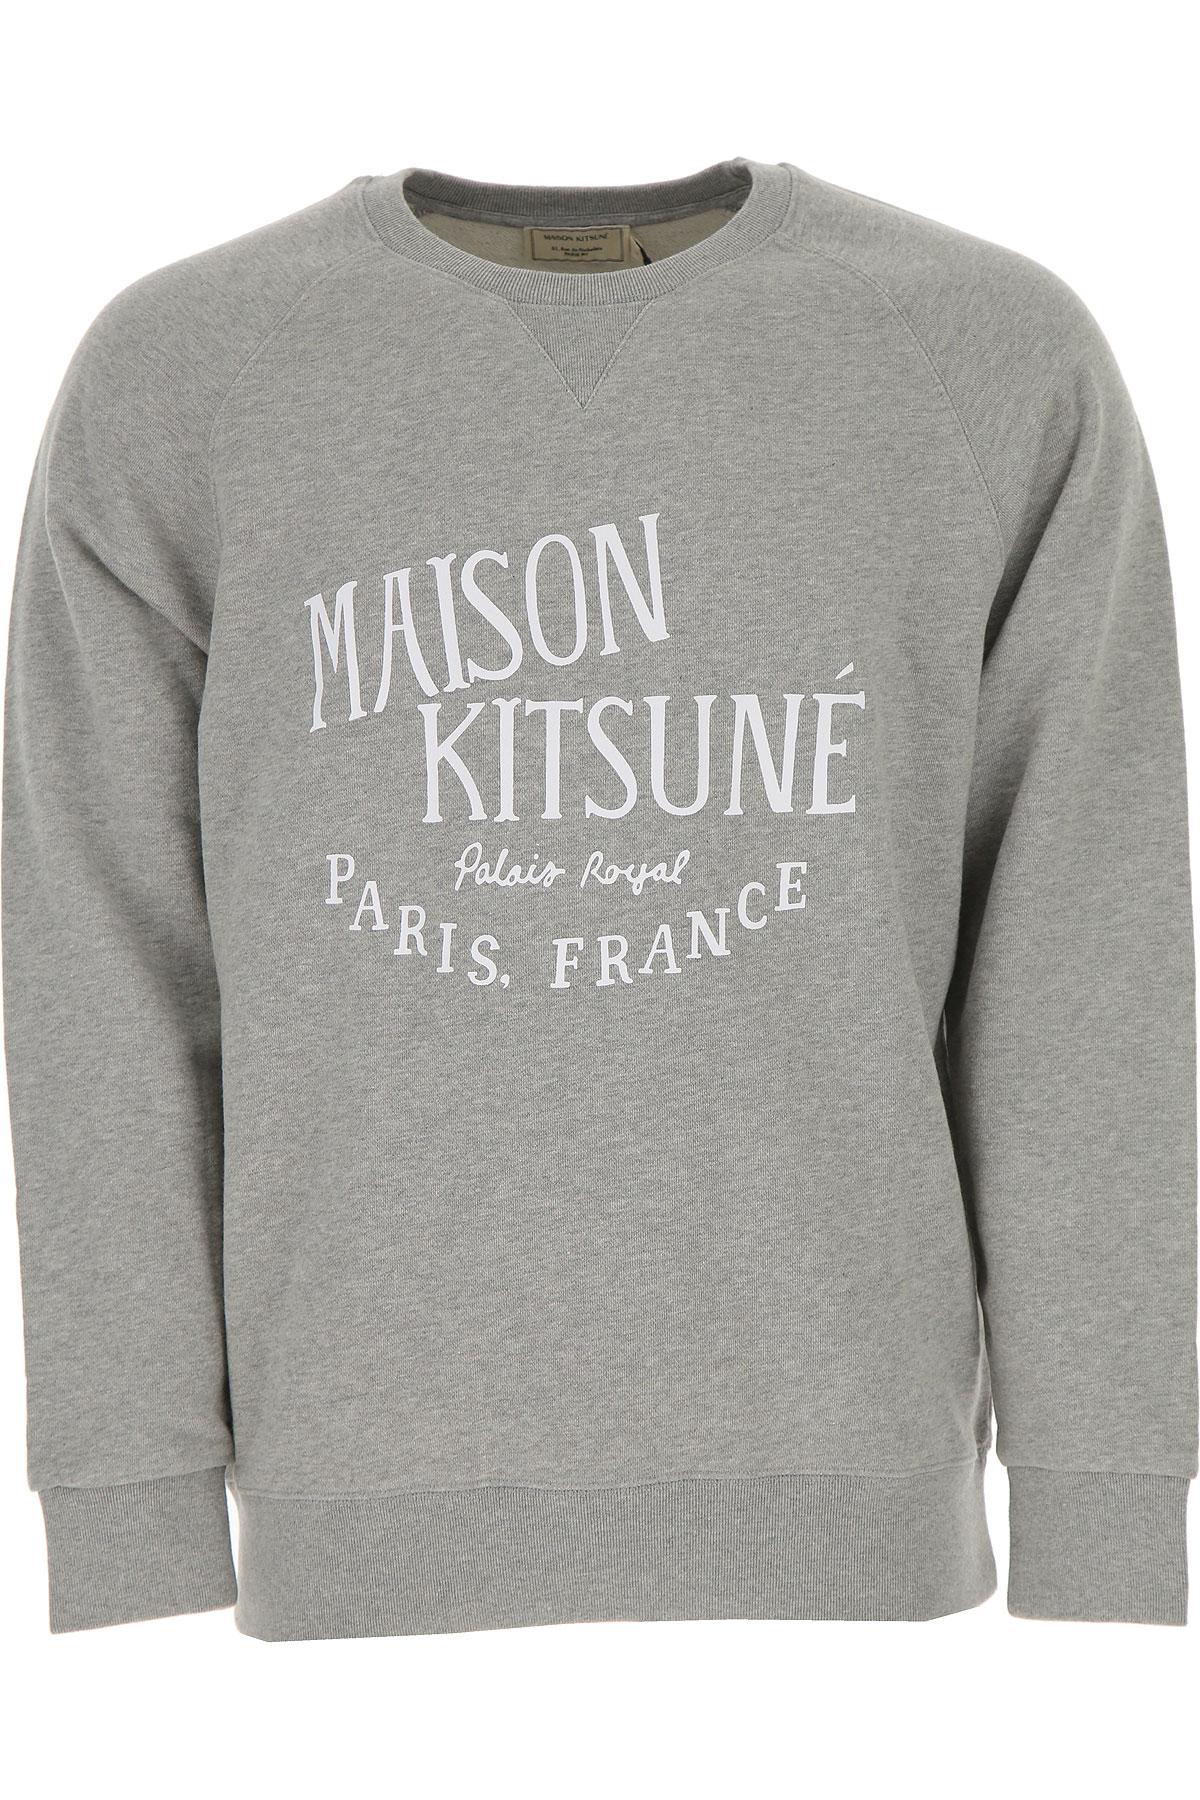 Maison Kitsune Sweatshirt for Men, Grey Light, Cotton, 2017, L M S XL USA-450388